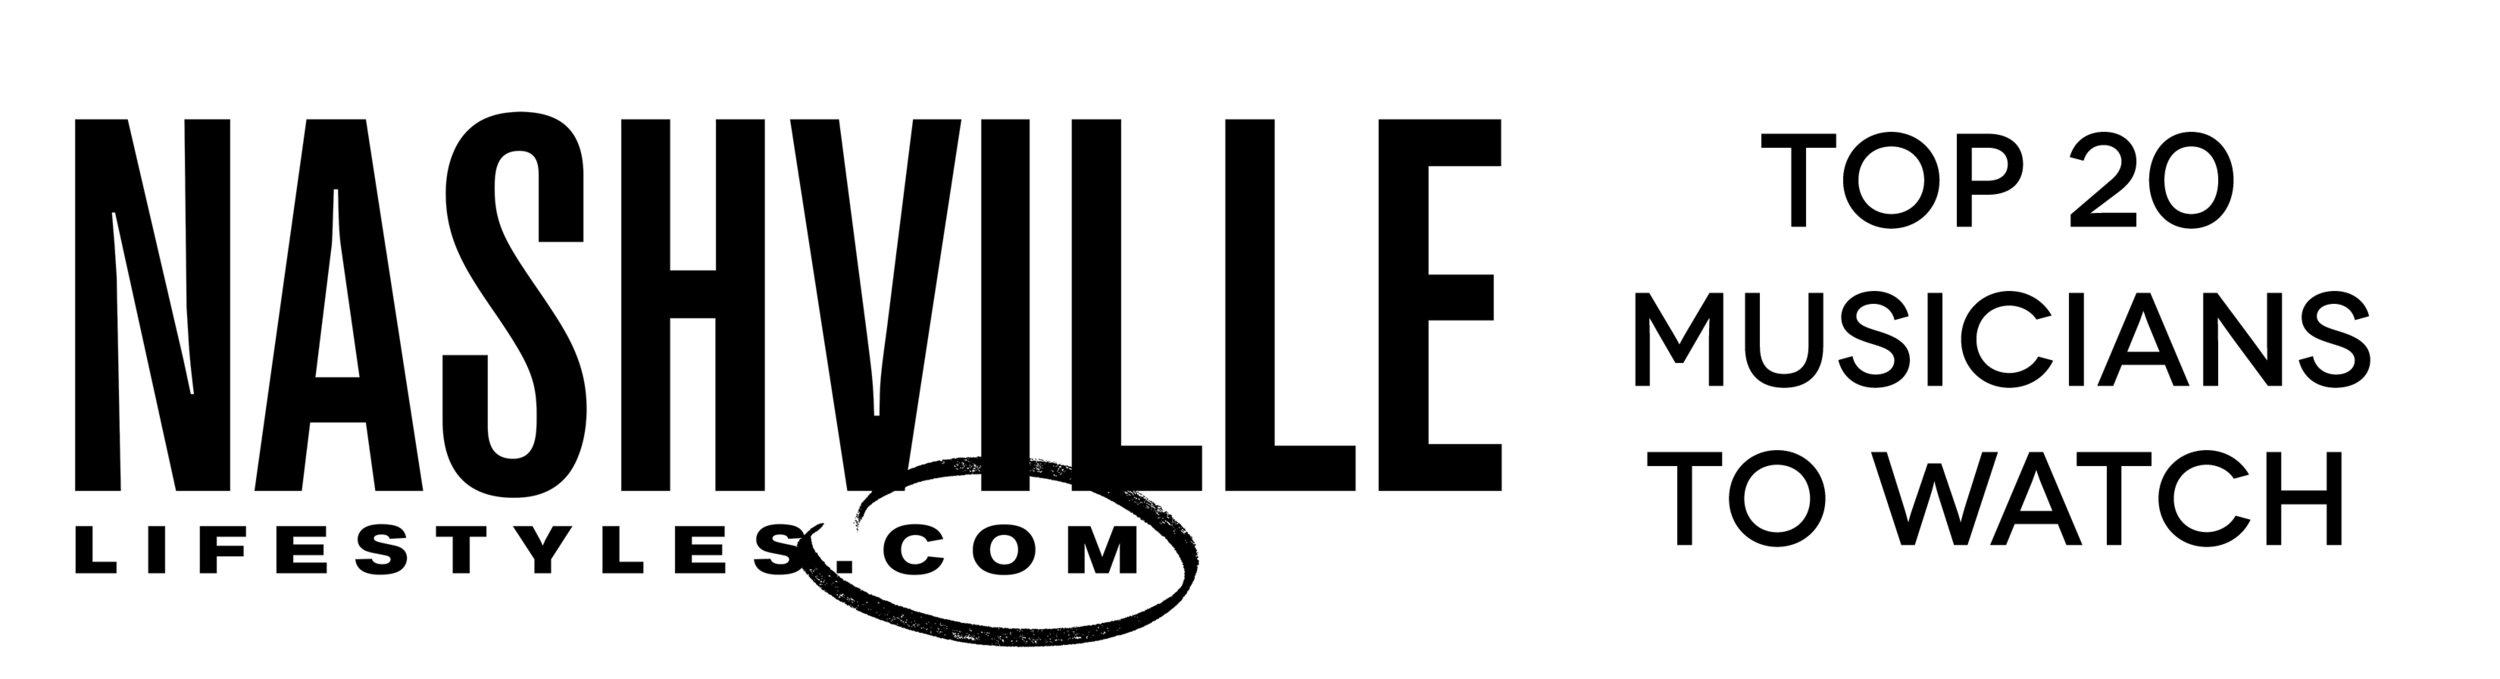 nashiville lifestyle.jpg